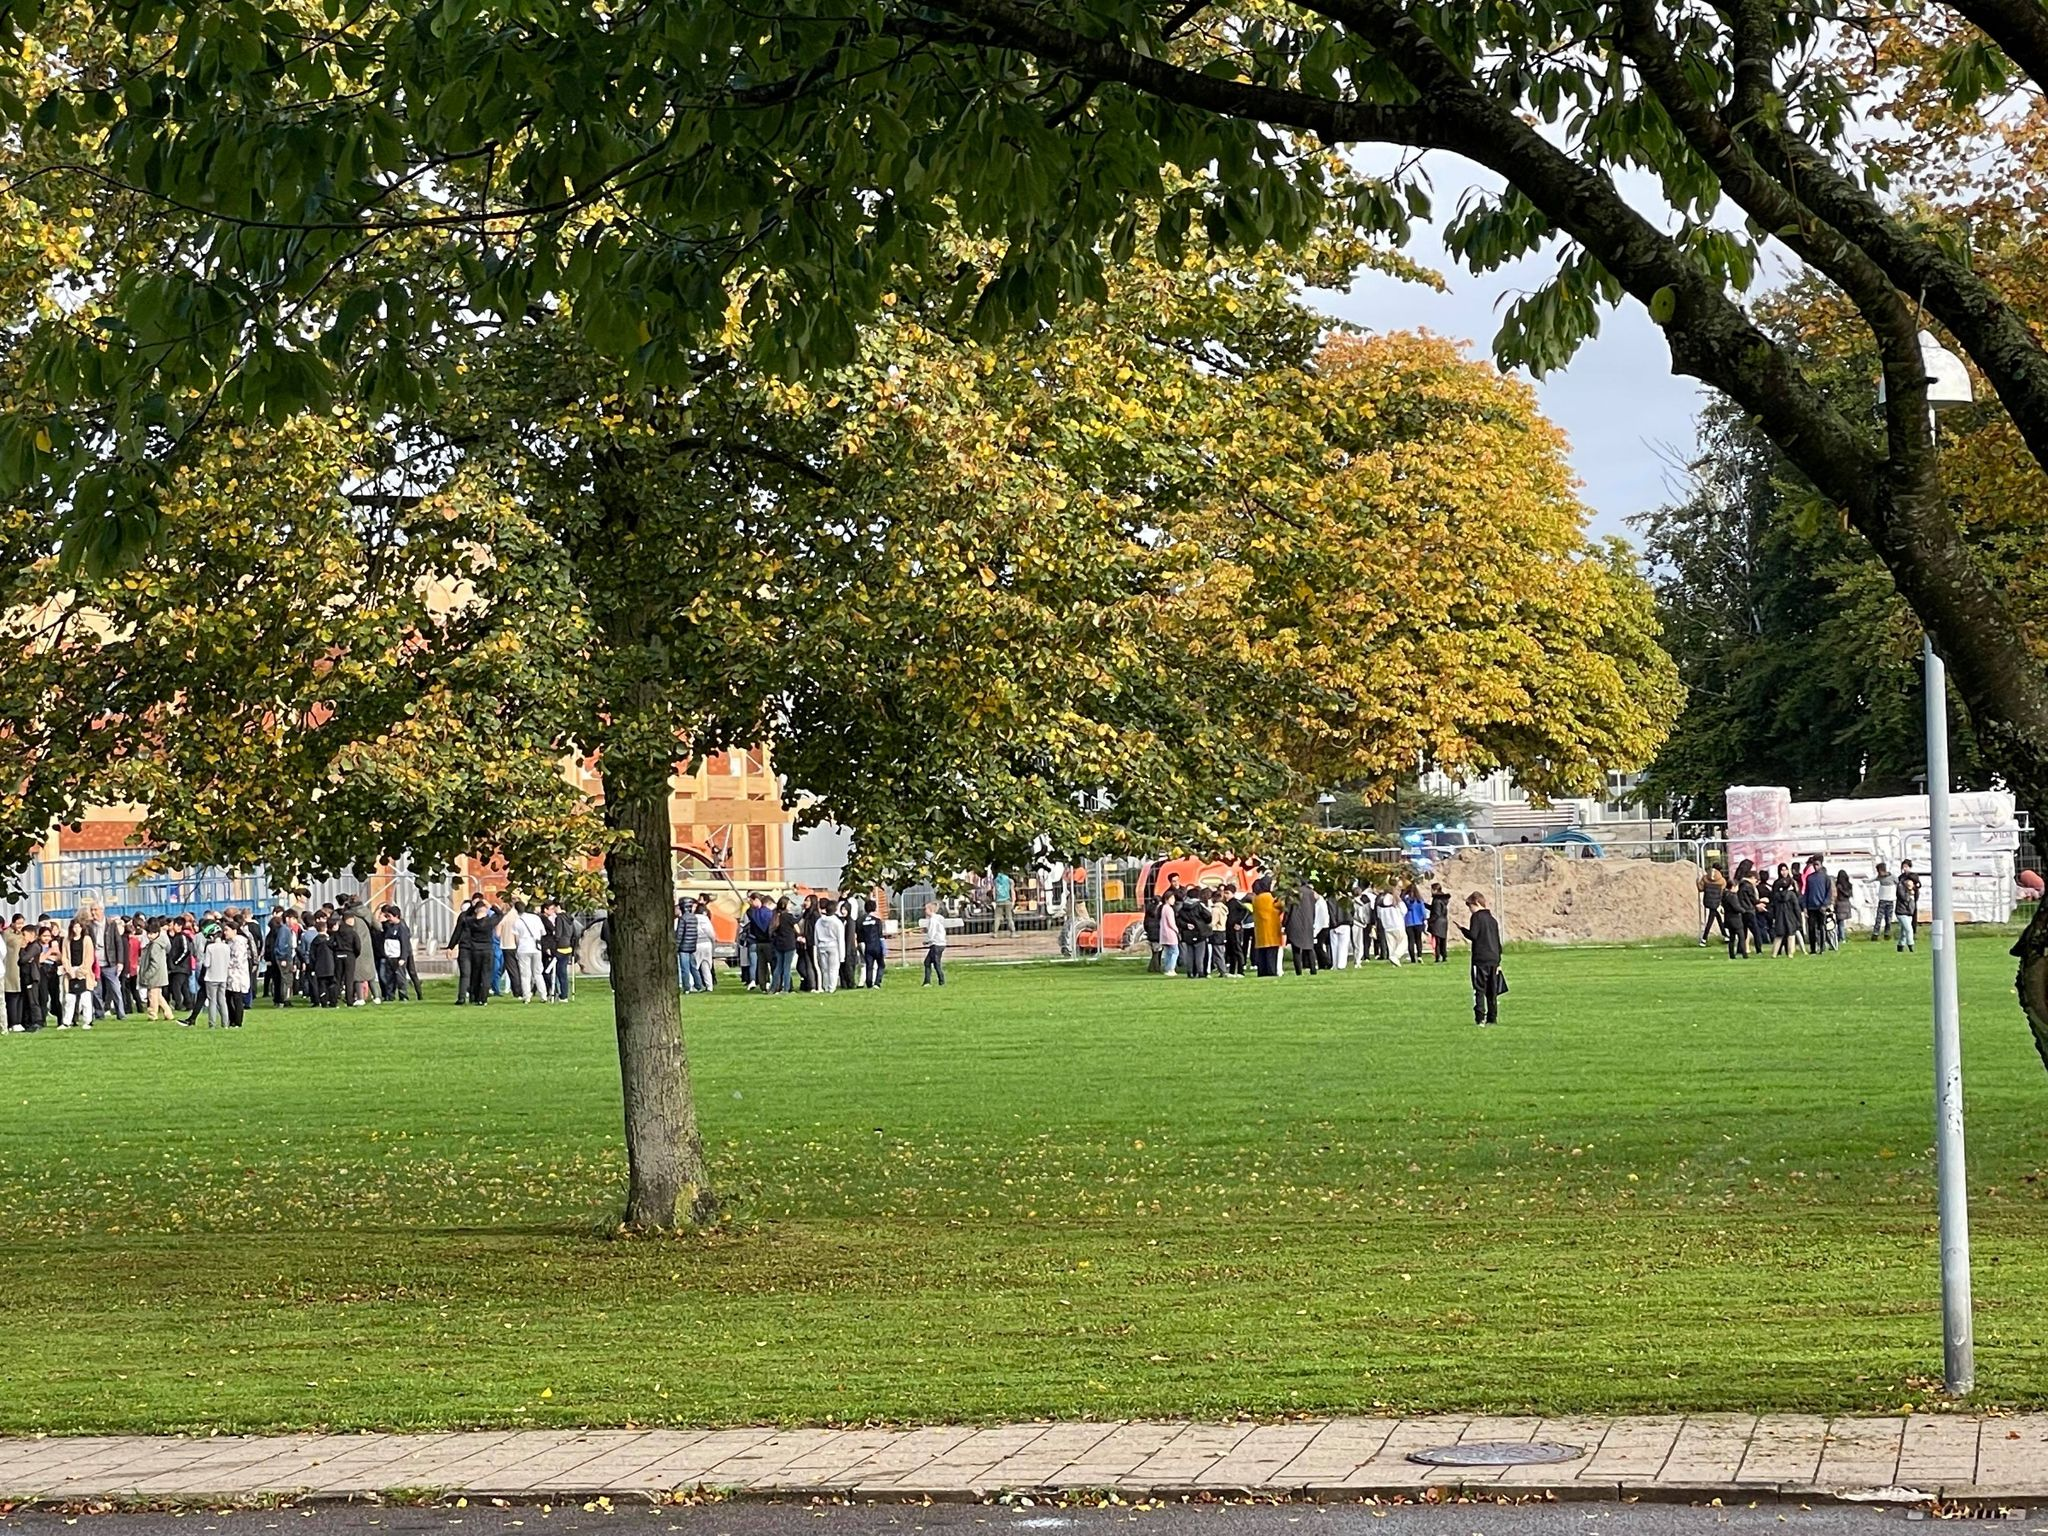 Meldinger om brand på skole i Brøndby - alle elever evakueret